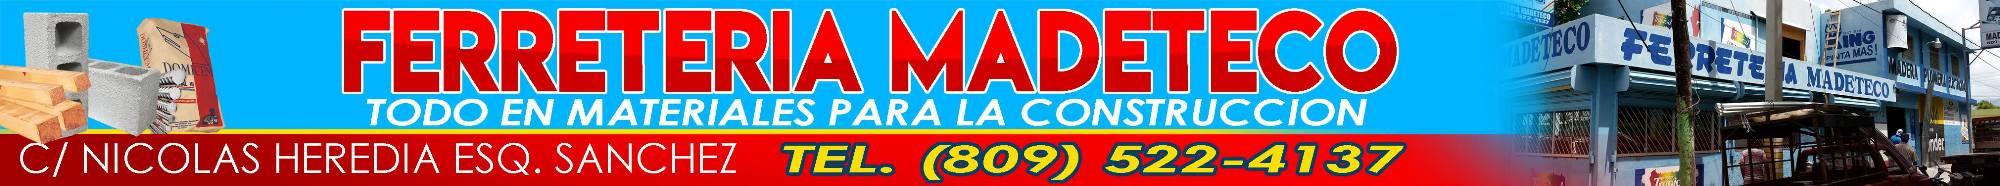 madeteco